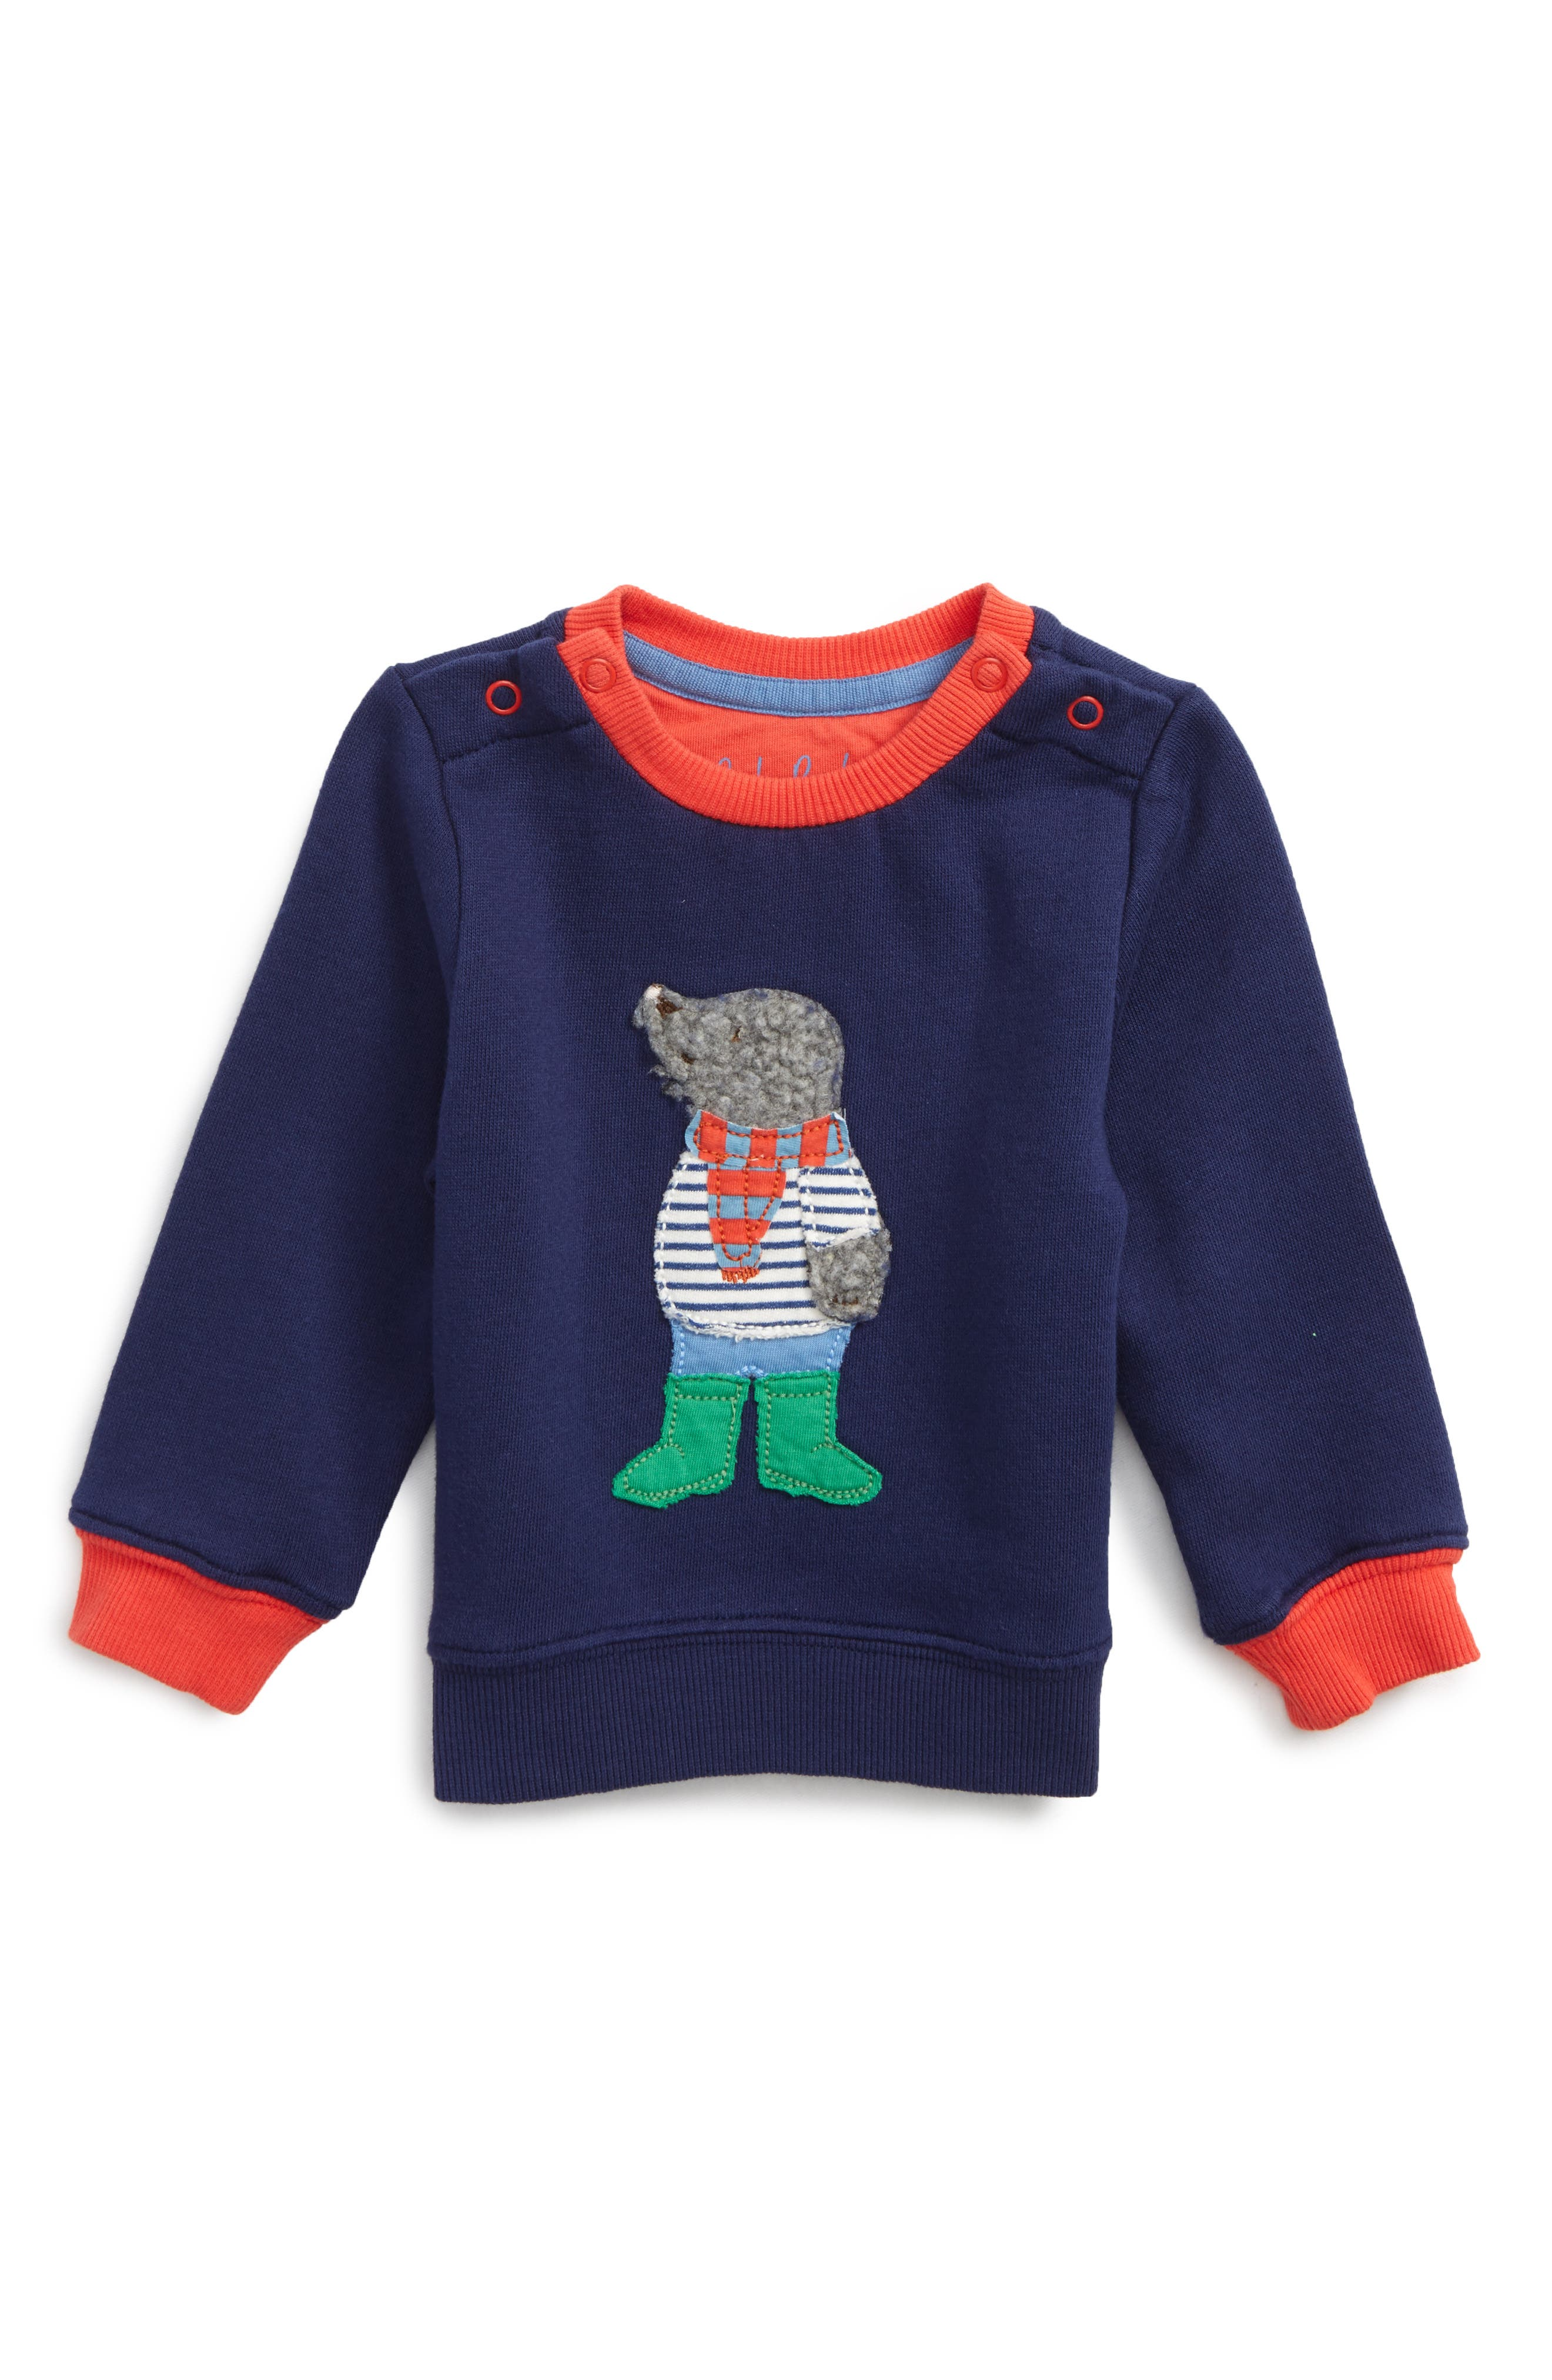 Appliqué Cozy Sweatshirt,                             Main thumbnail 1, color,                             Blue Beacon